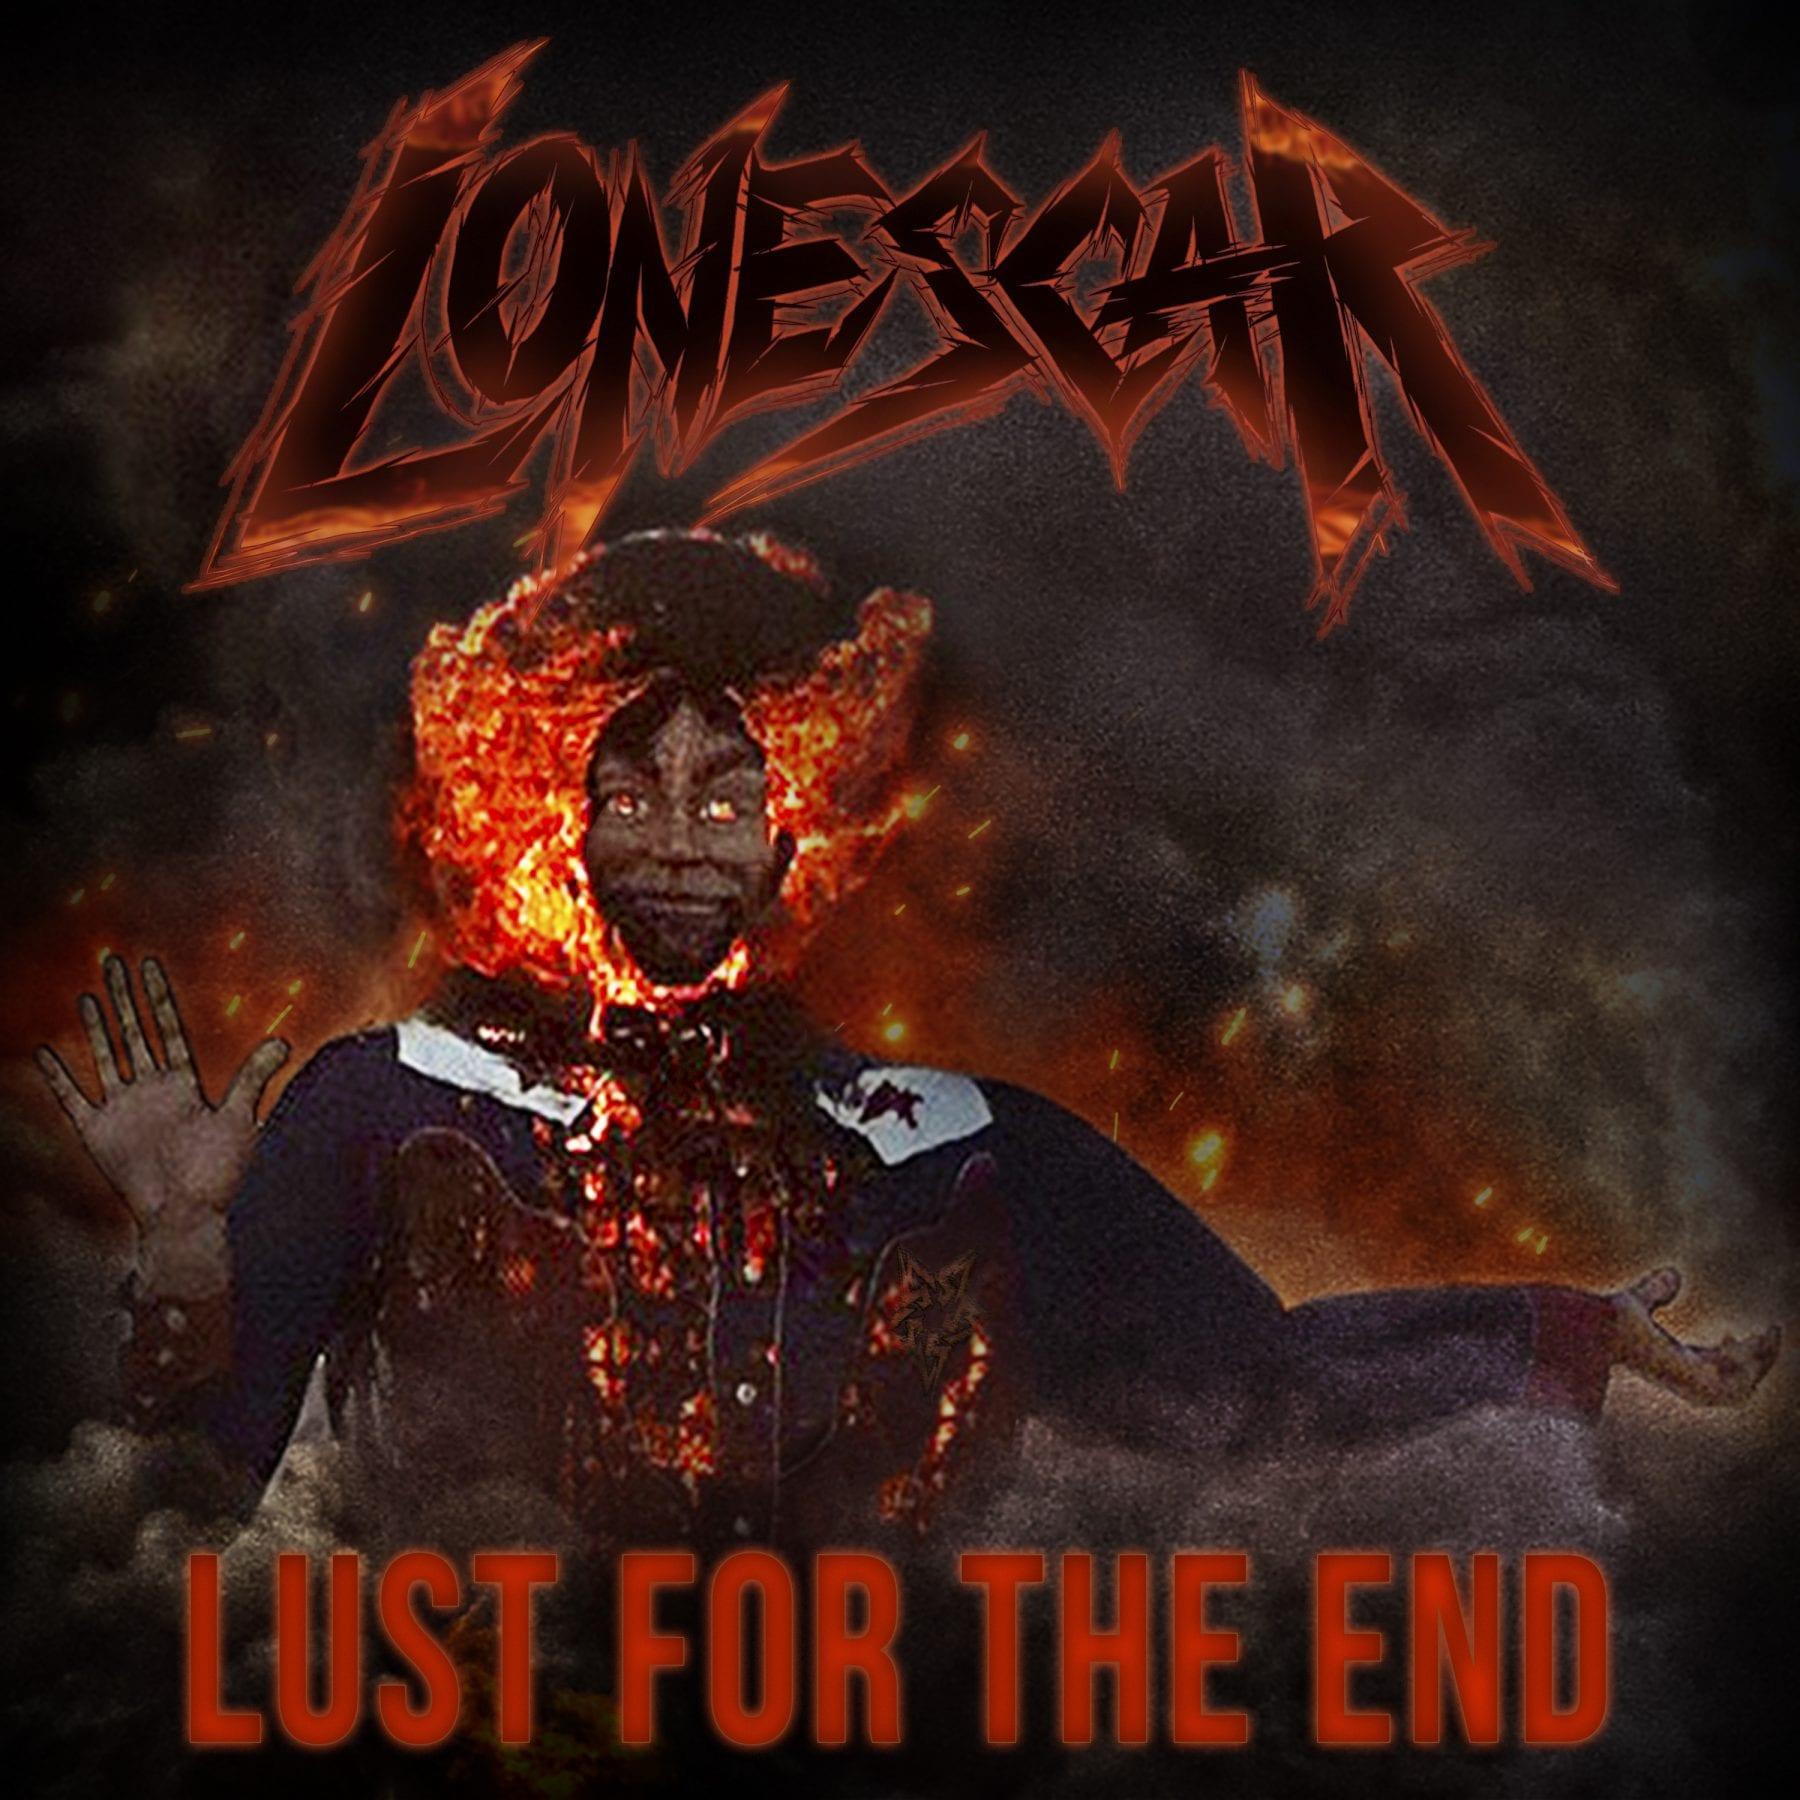 Lonescar on Selective Memory